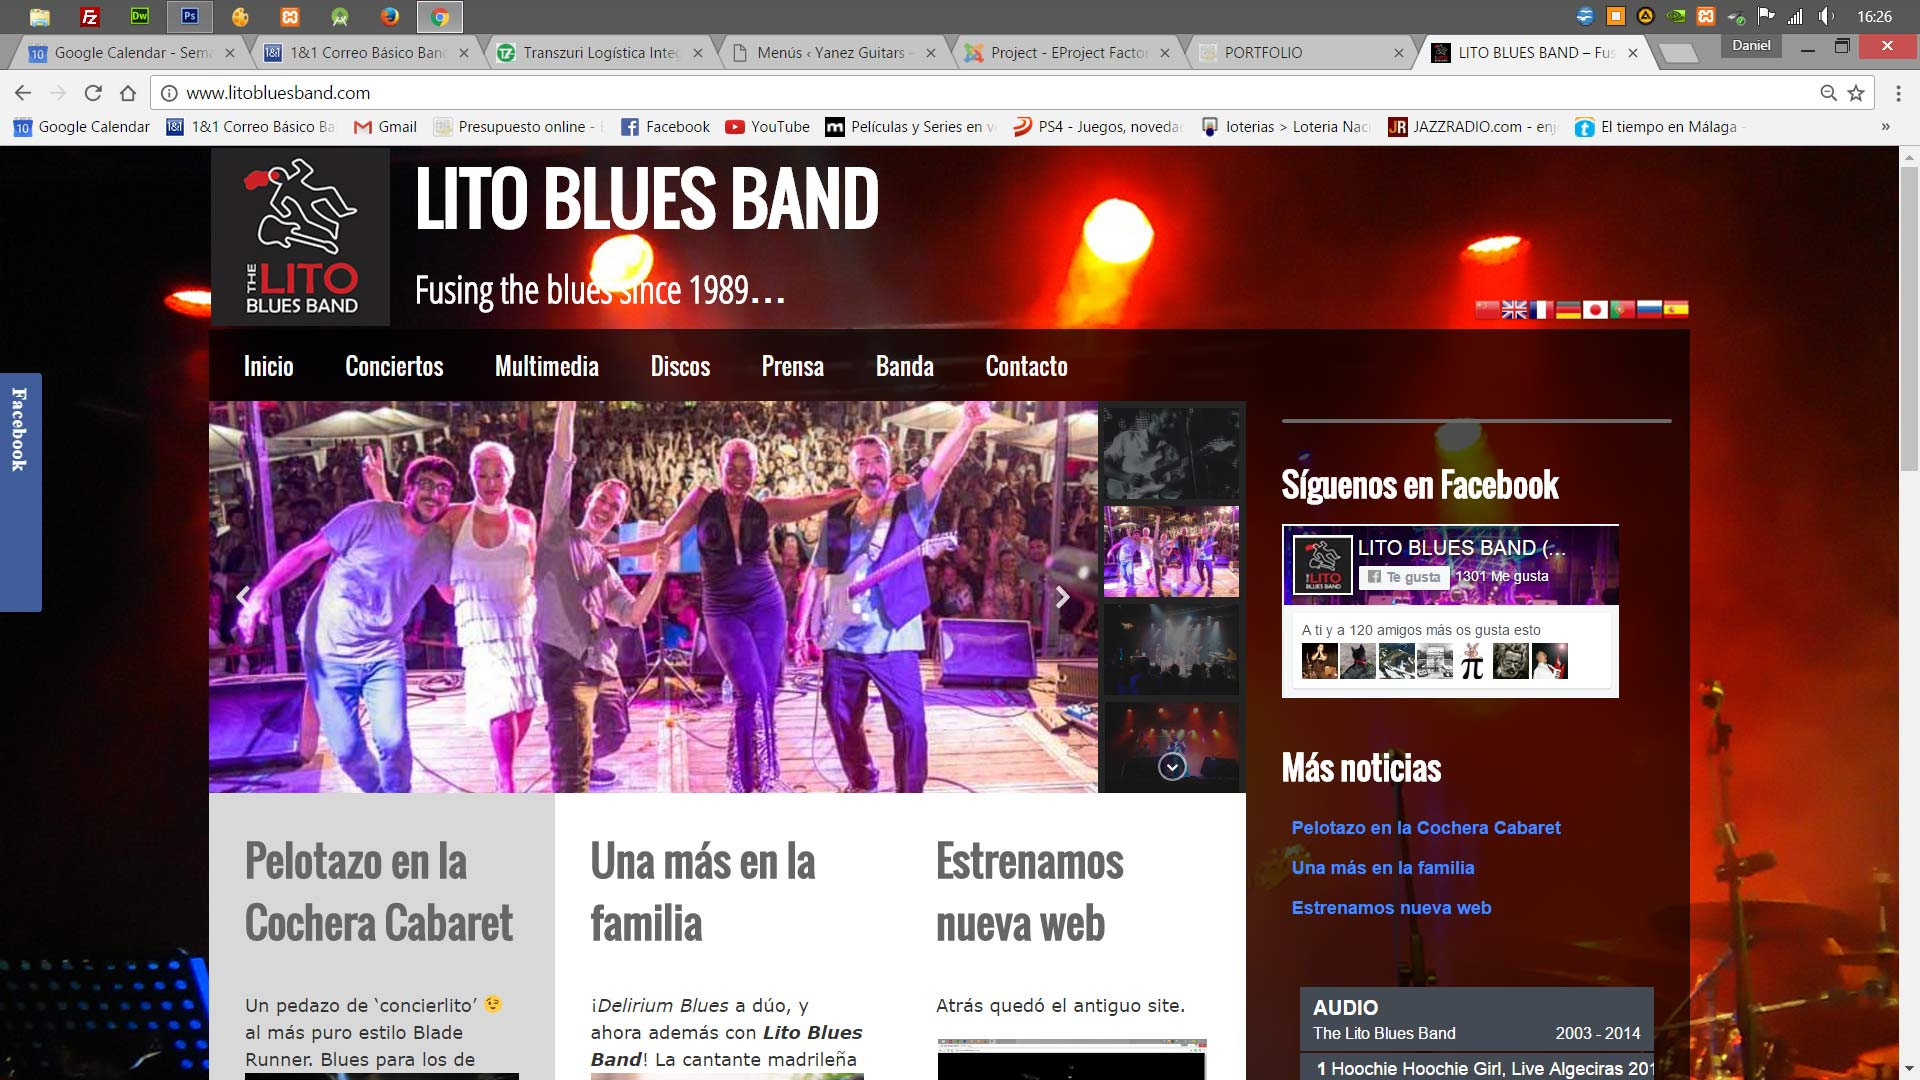 Lito Blues Band (2ª)